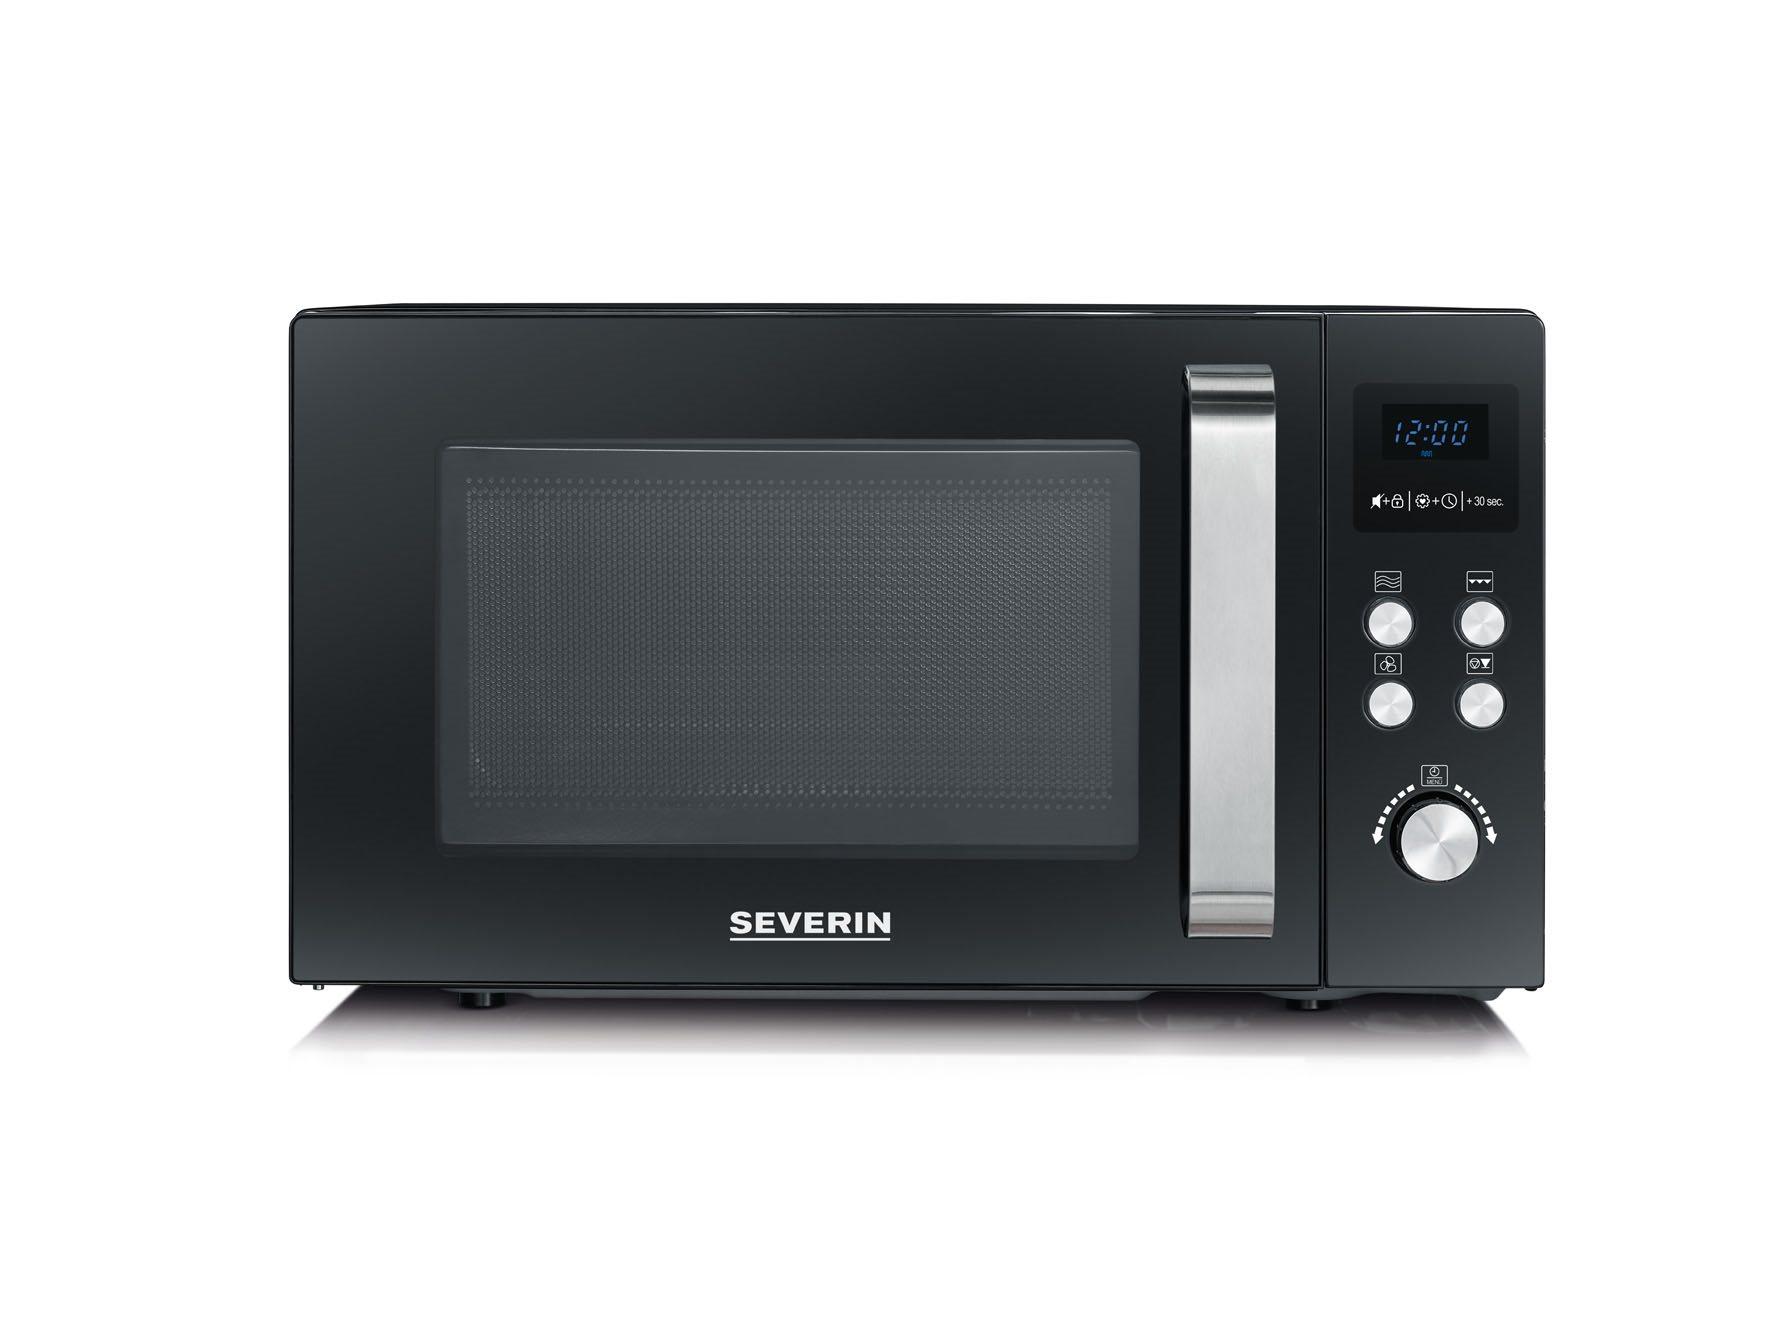 SEVERIN Φούρνος Μικροκυμάτων 23lt, 900W με Grill και Συμβατός Μαύρος - 7752